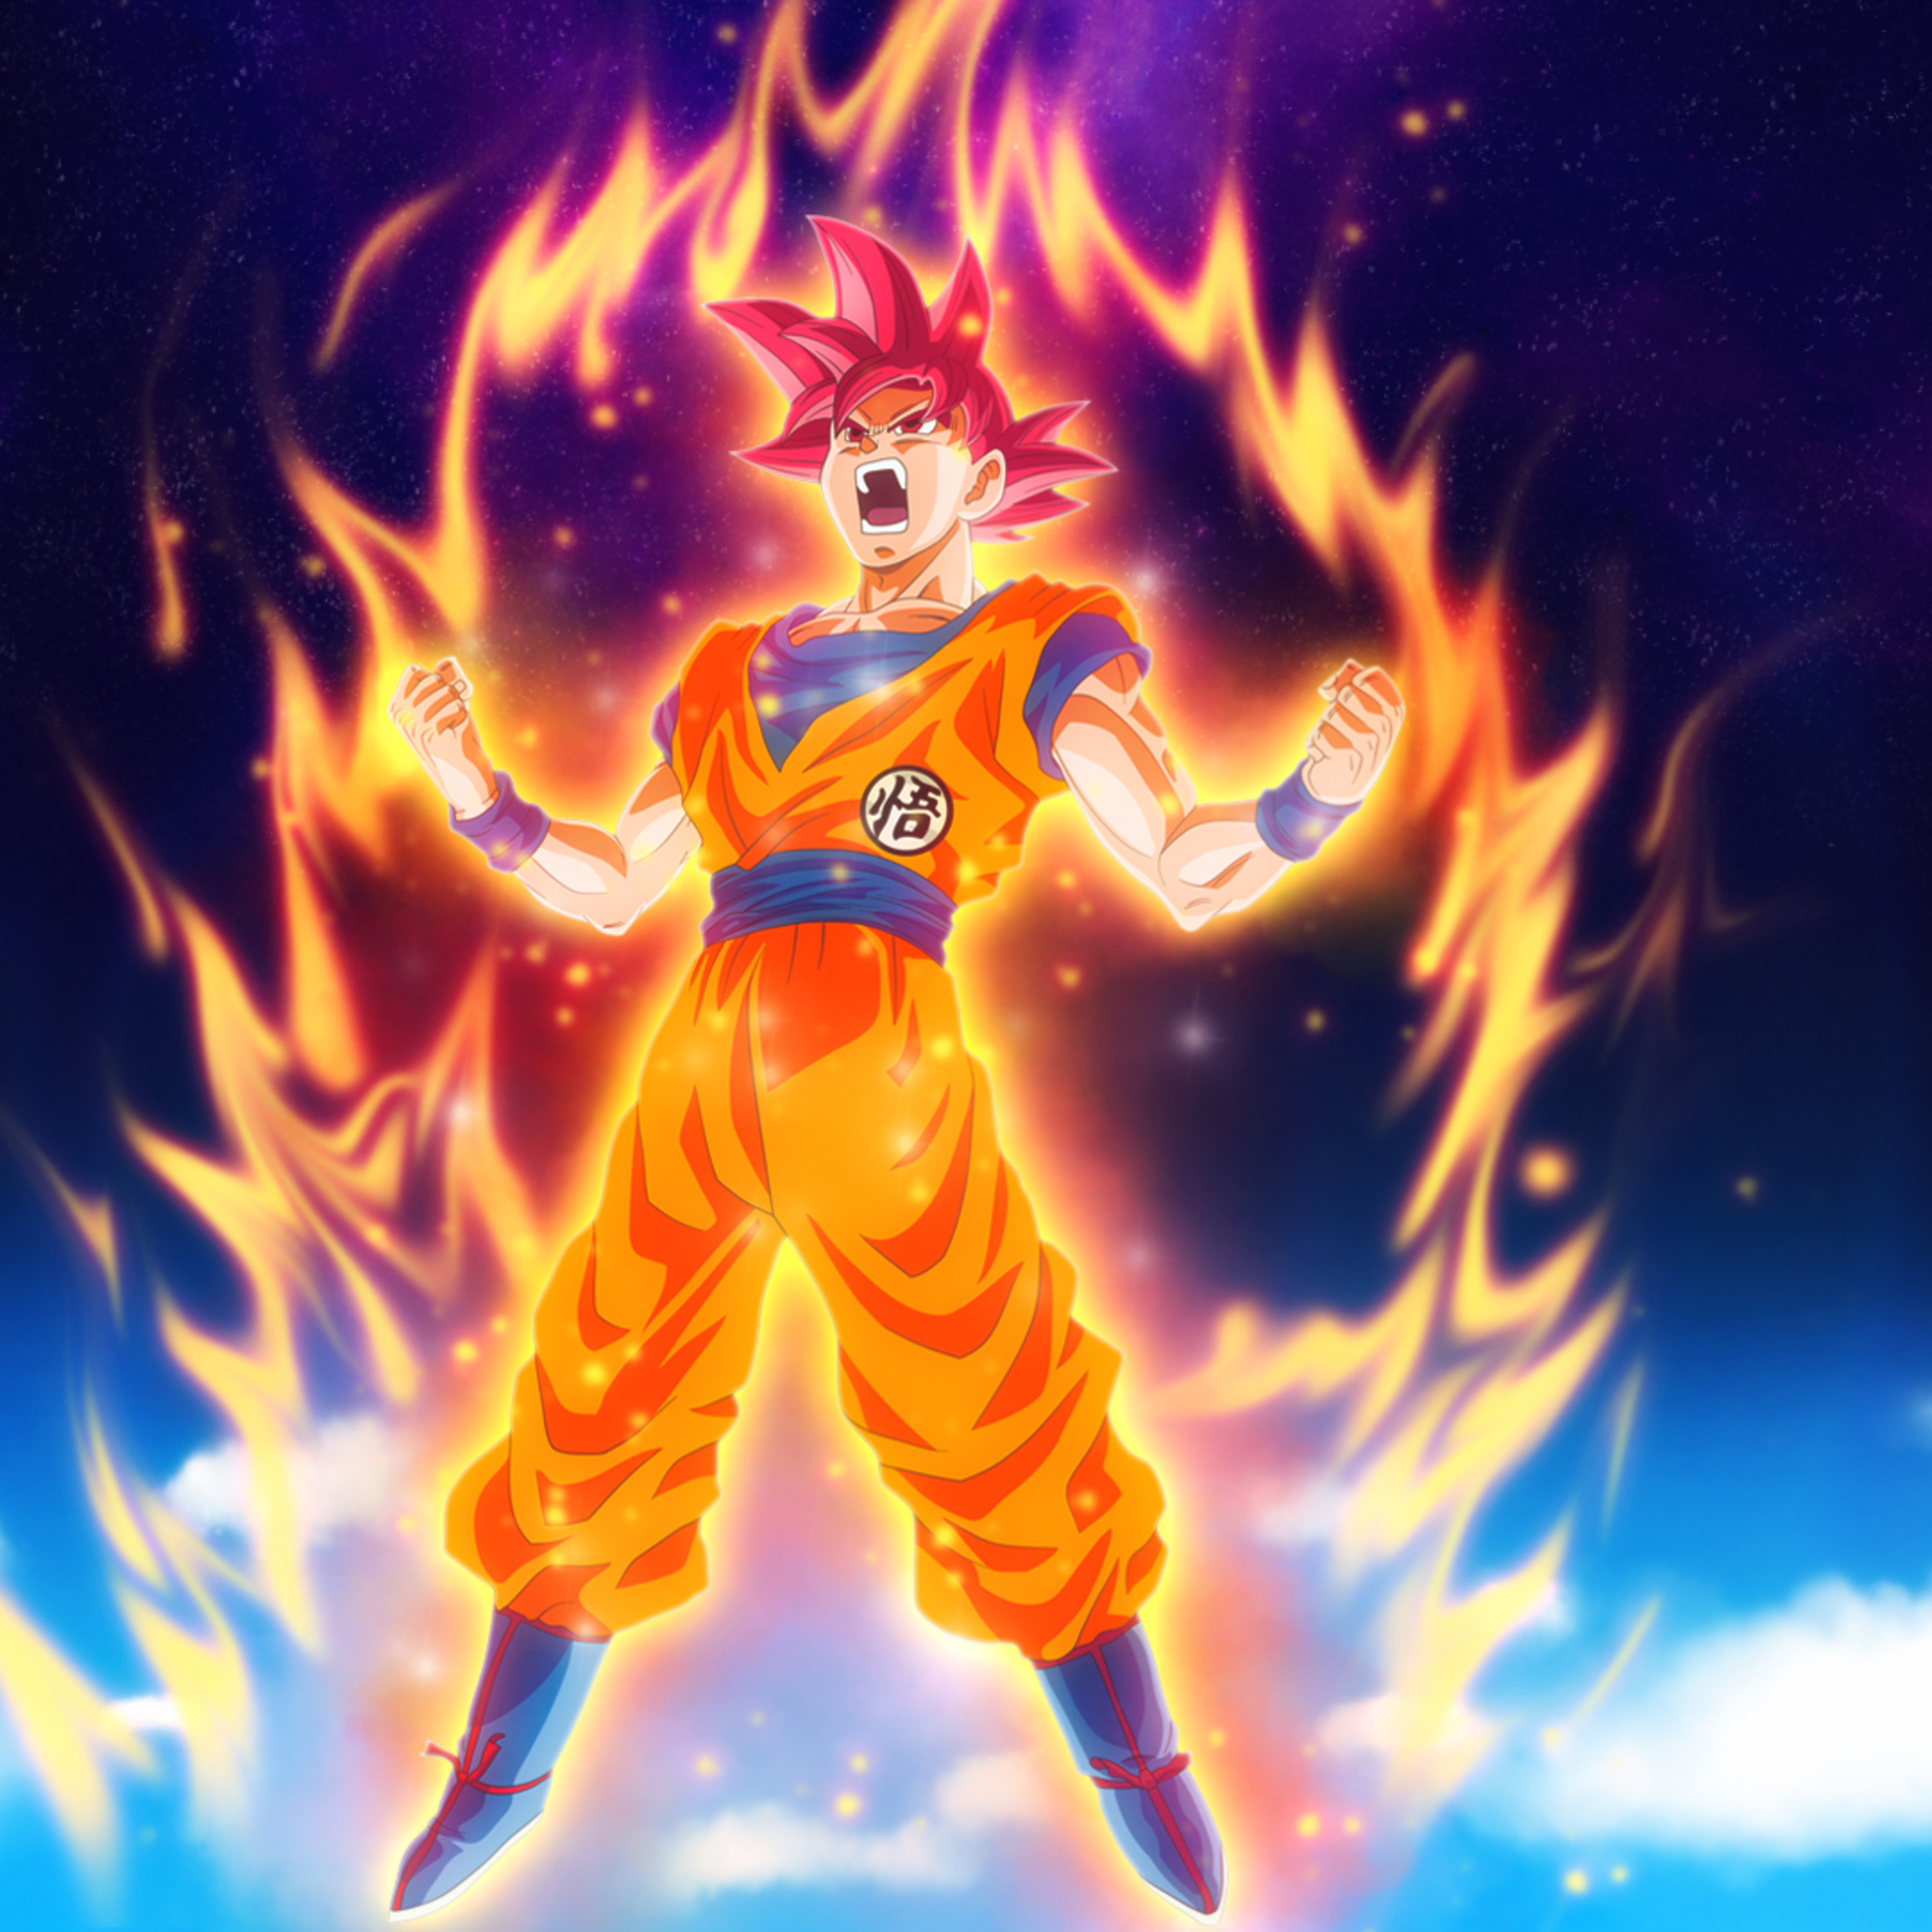 2932x2932 Dragon Ball Z Goku Ipad Pro Retina Display Hd 4k